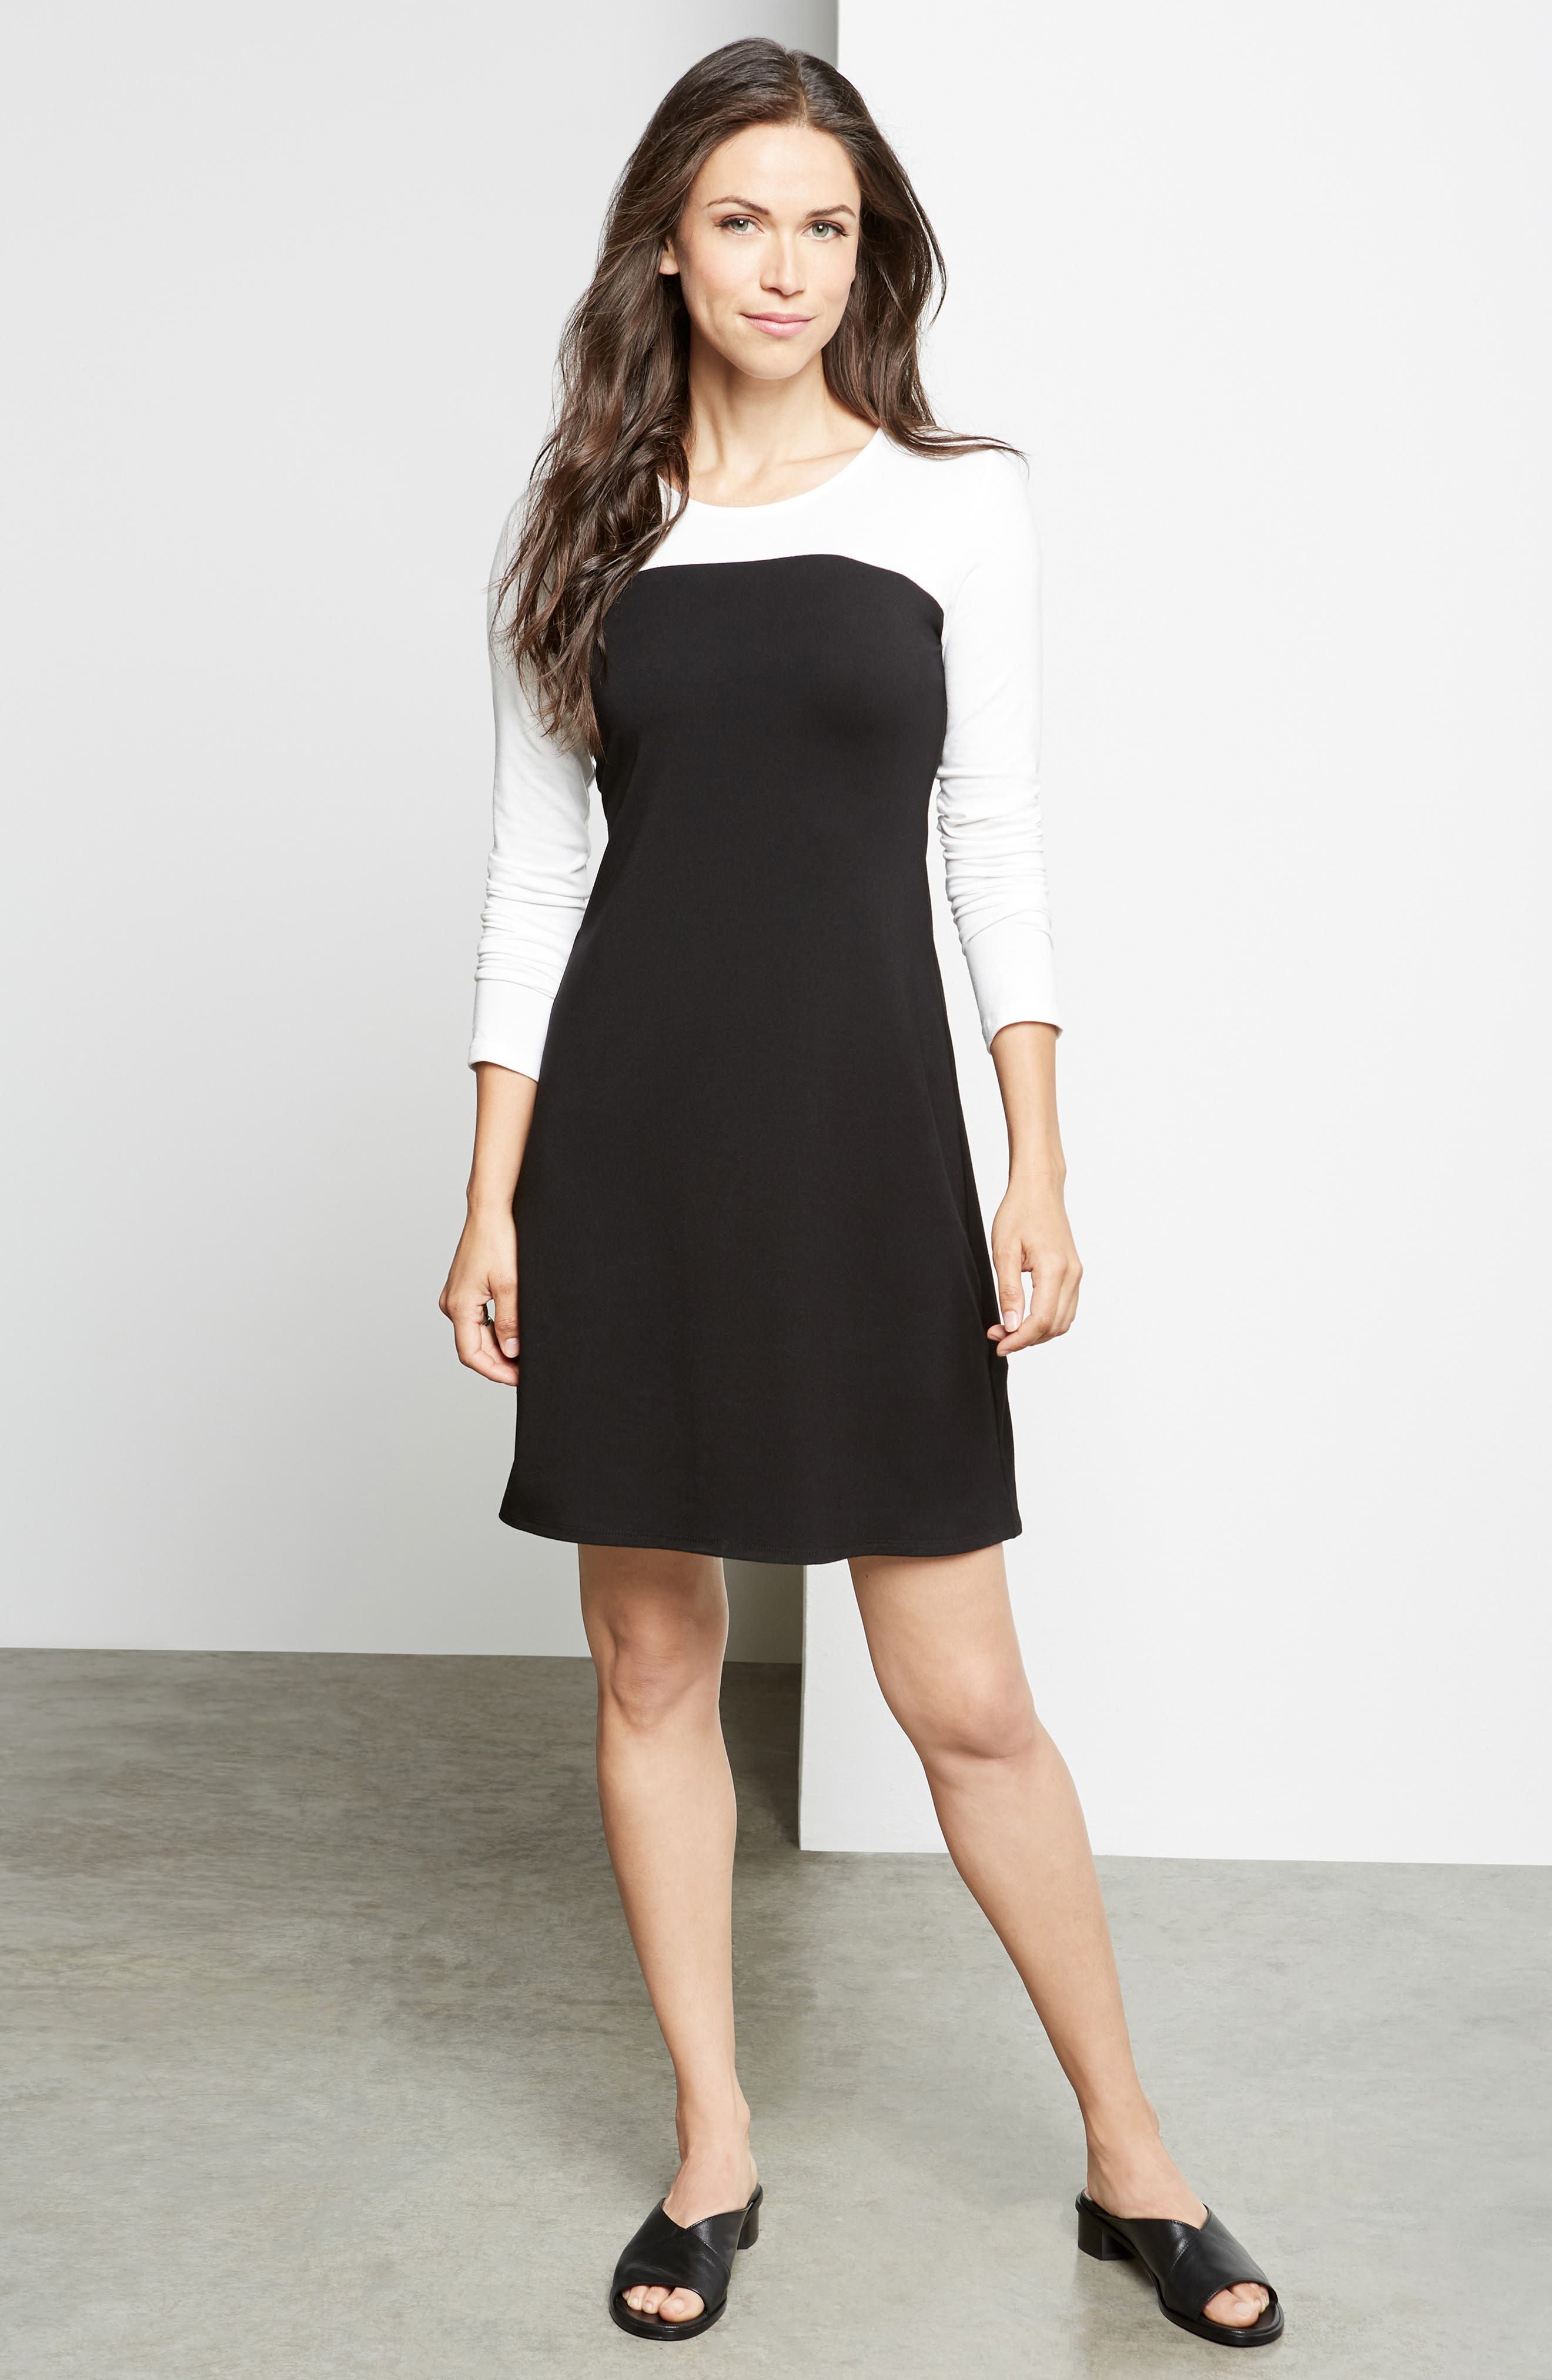 KAREN KANE, Colorblock Sheath Dress, Alternate thumbnail 5, color, BLACK WITH OFF WHITE